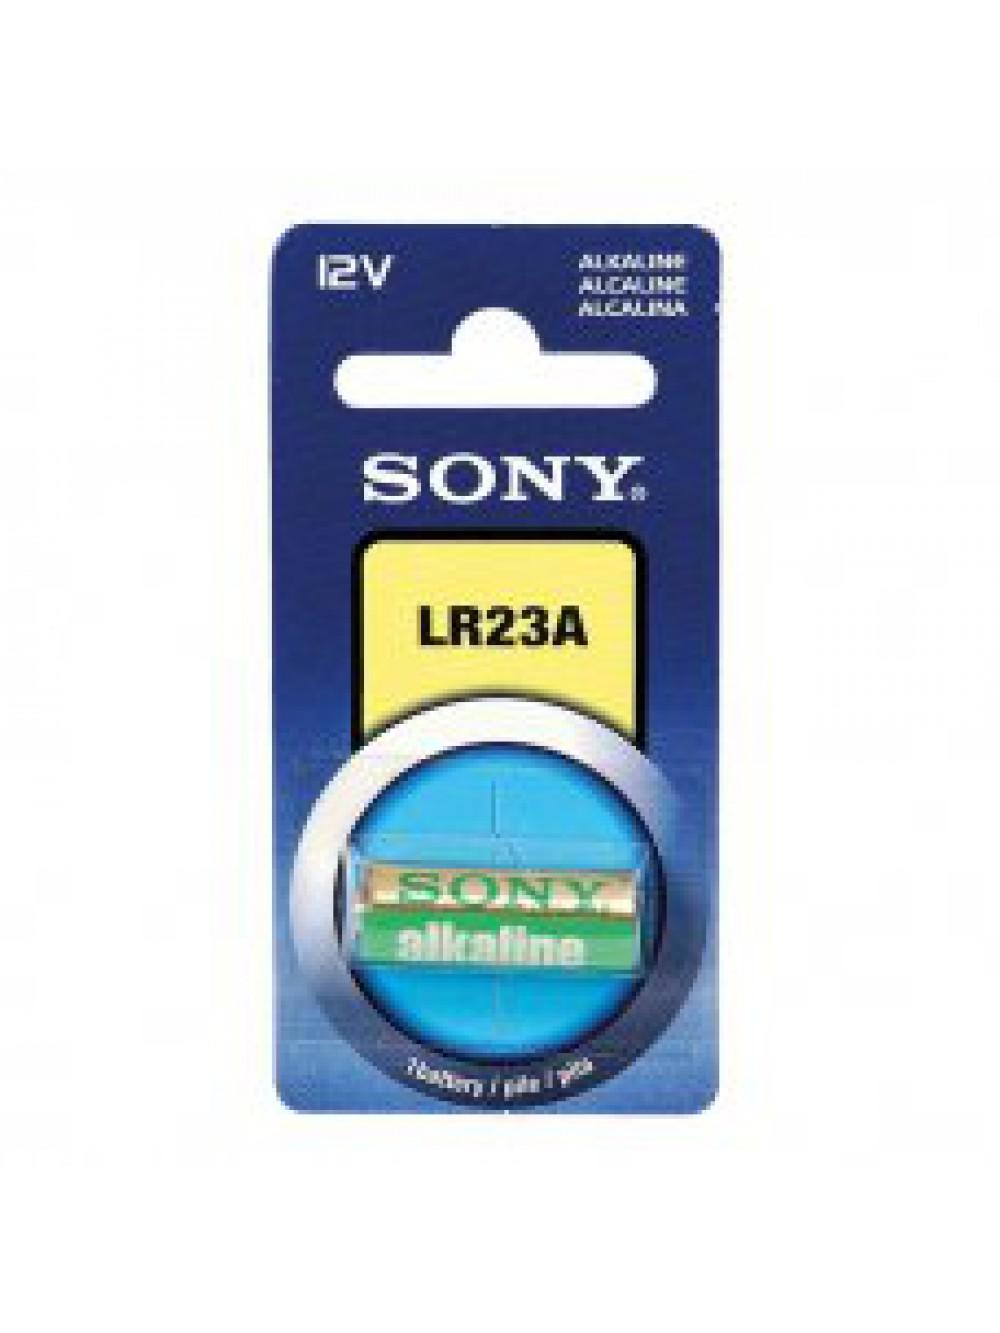 Sony LR23, 12V, miniAlkaline Alkaline 12V - non-rechargeable batteries (12V, miniAlkaline, Alkaline, Cylindrical)